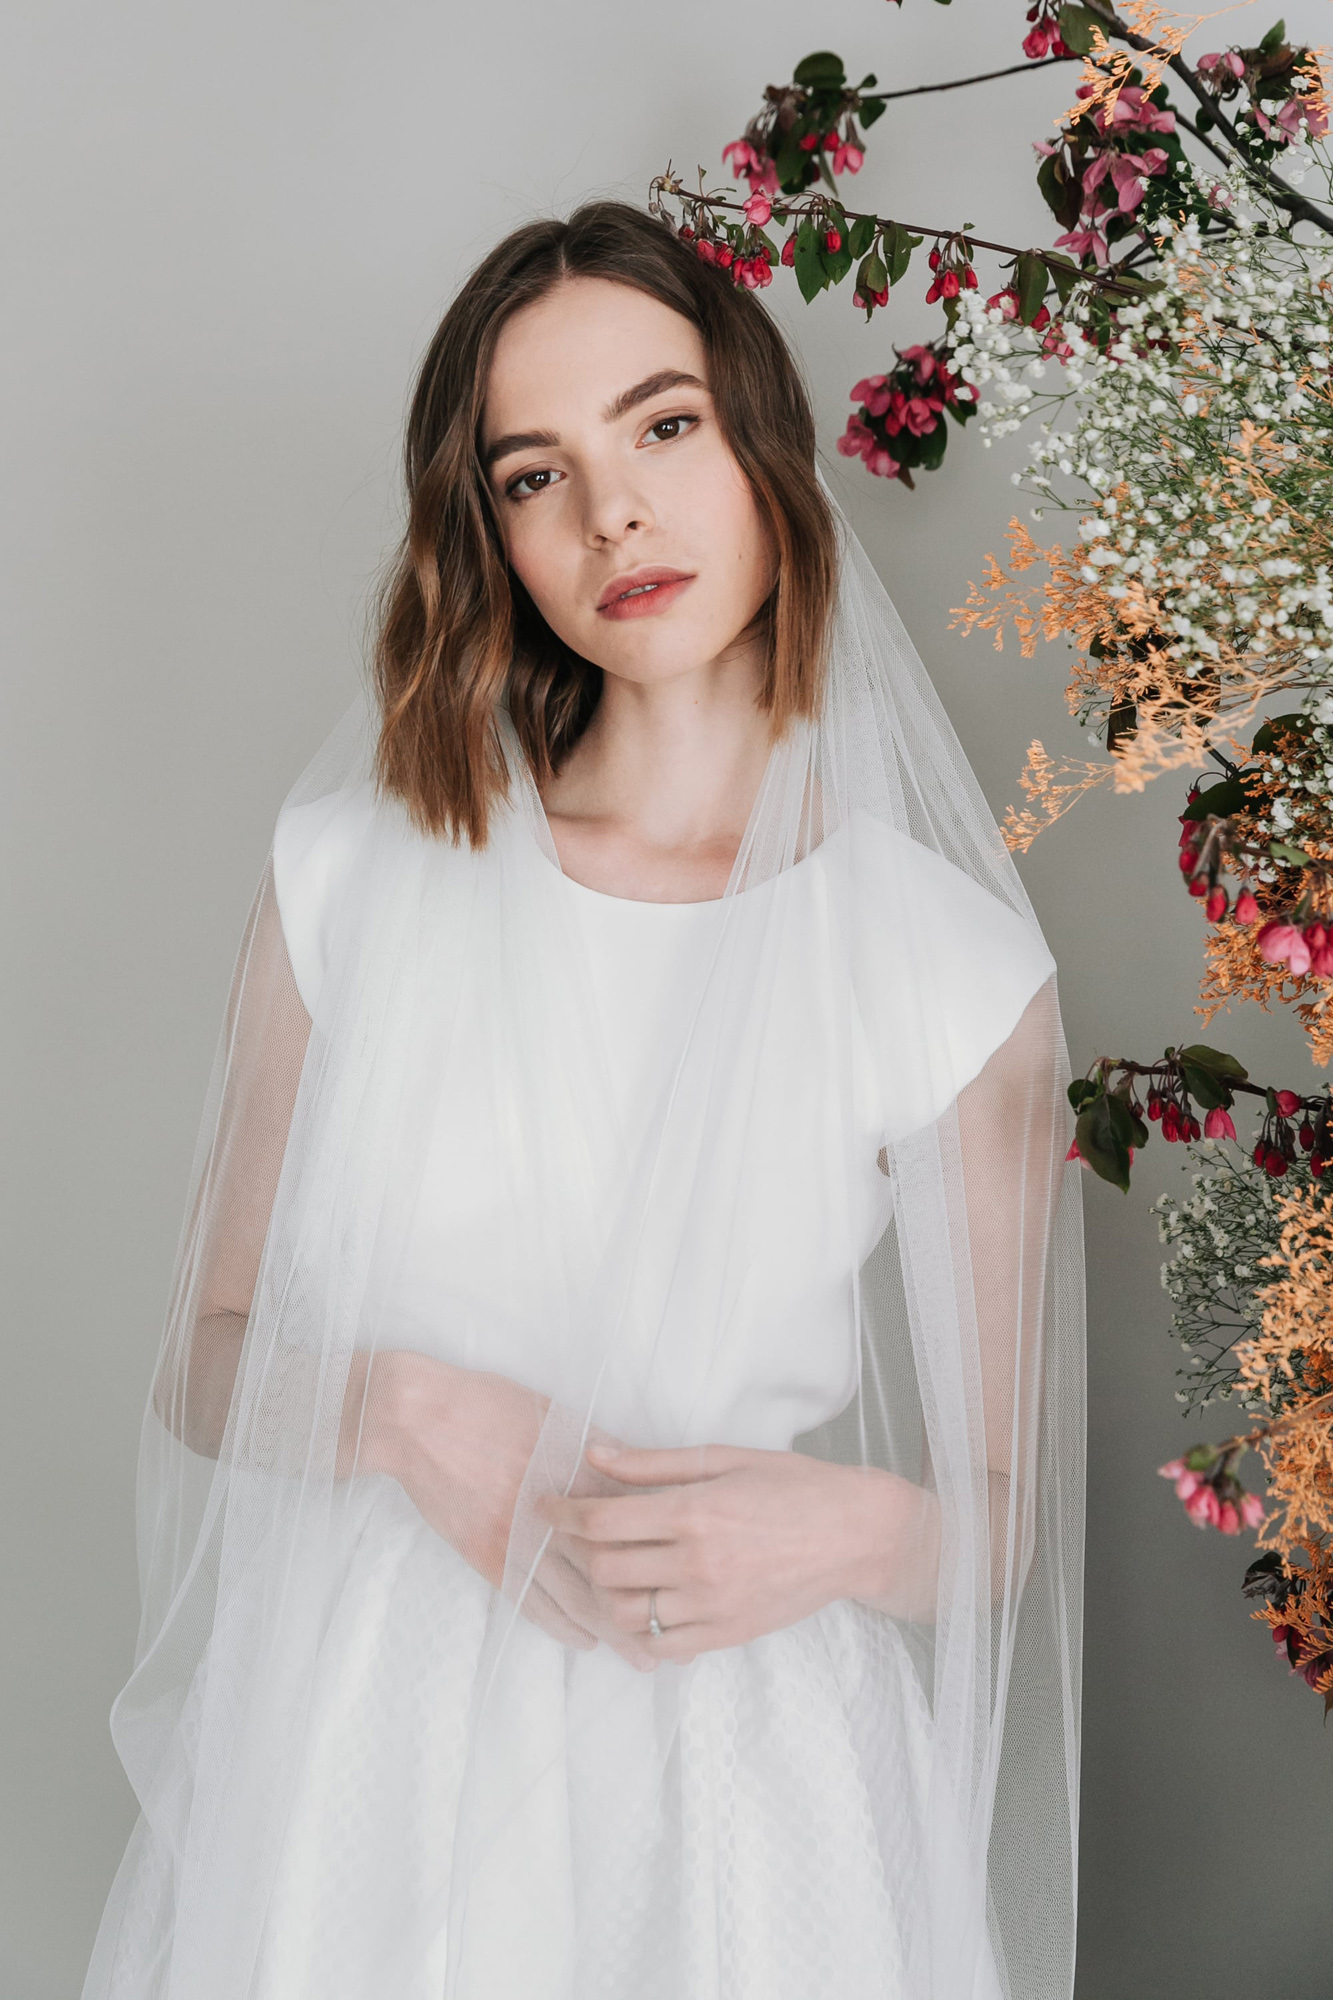 Kate-Beaumont-Sheffield-Zinnia-Modern-Wedding-Gown-Polka-Dot-Pleated-Skirt-14.jpg